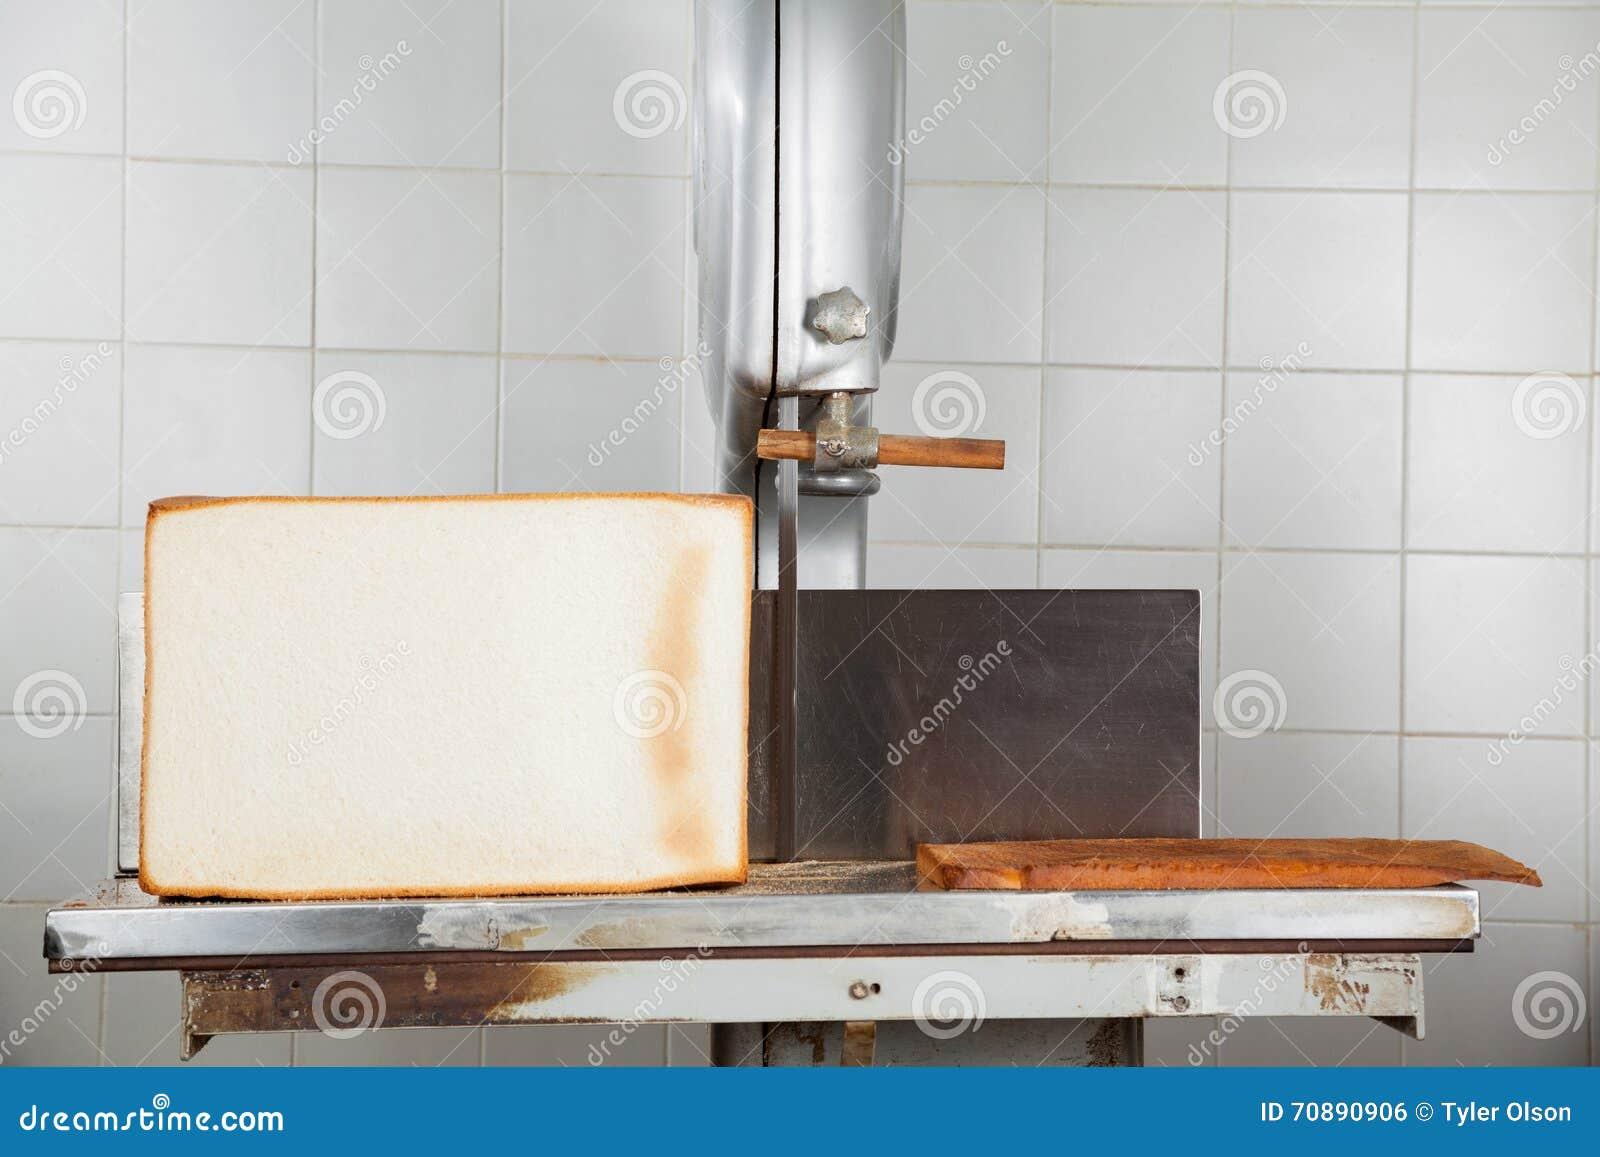 bakery cutting machine